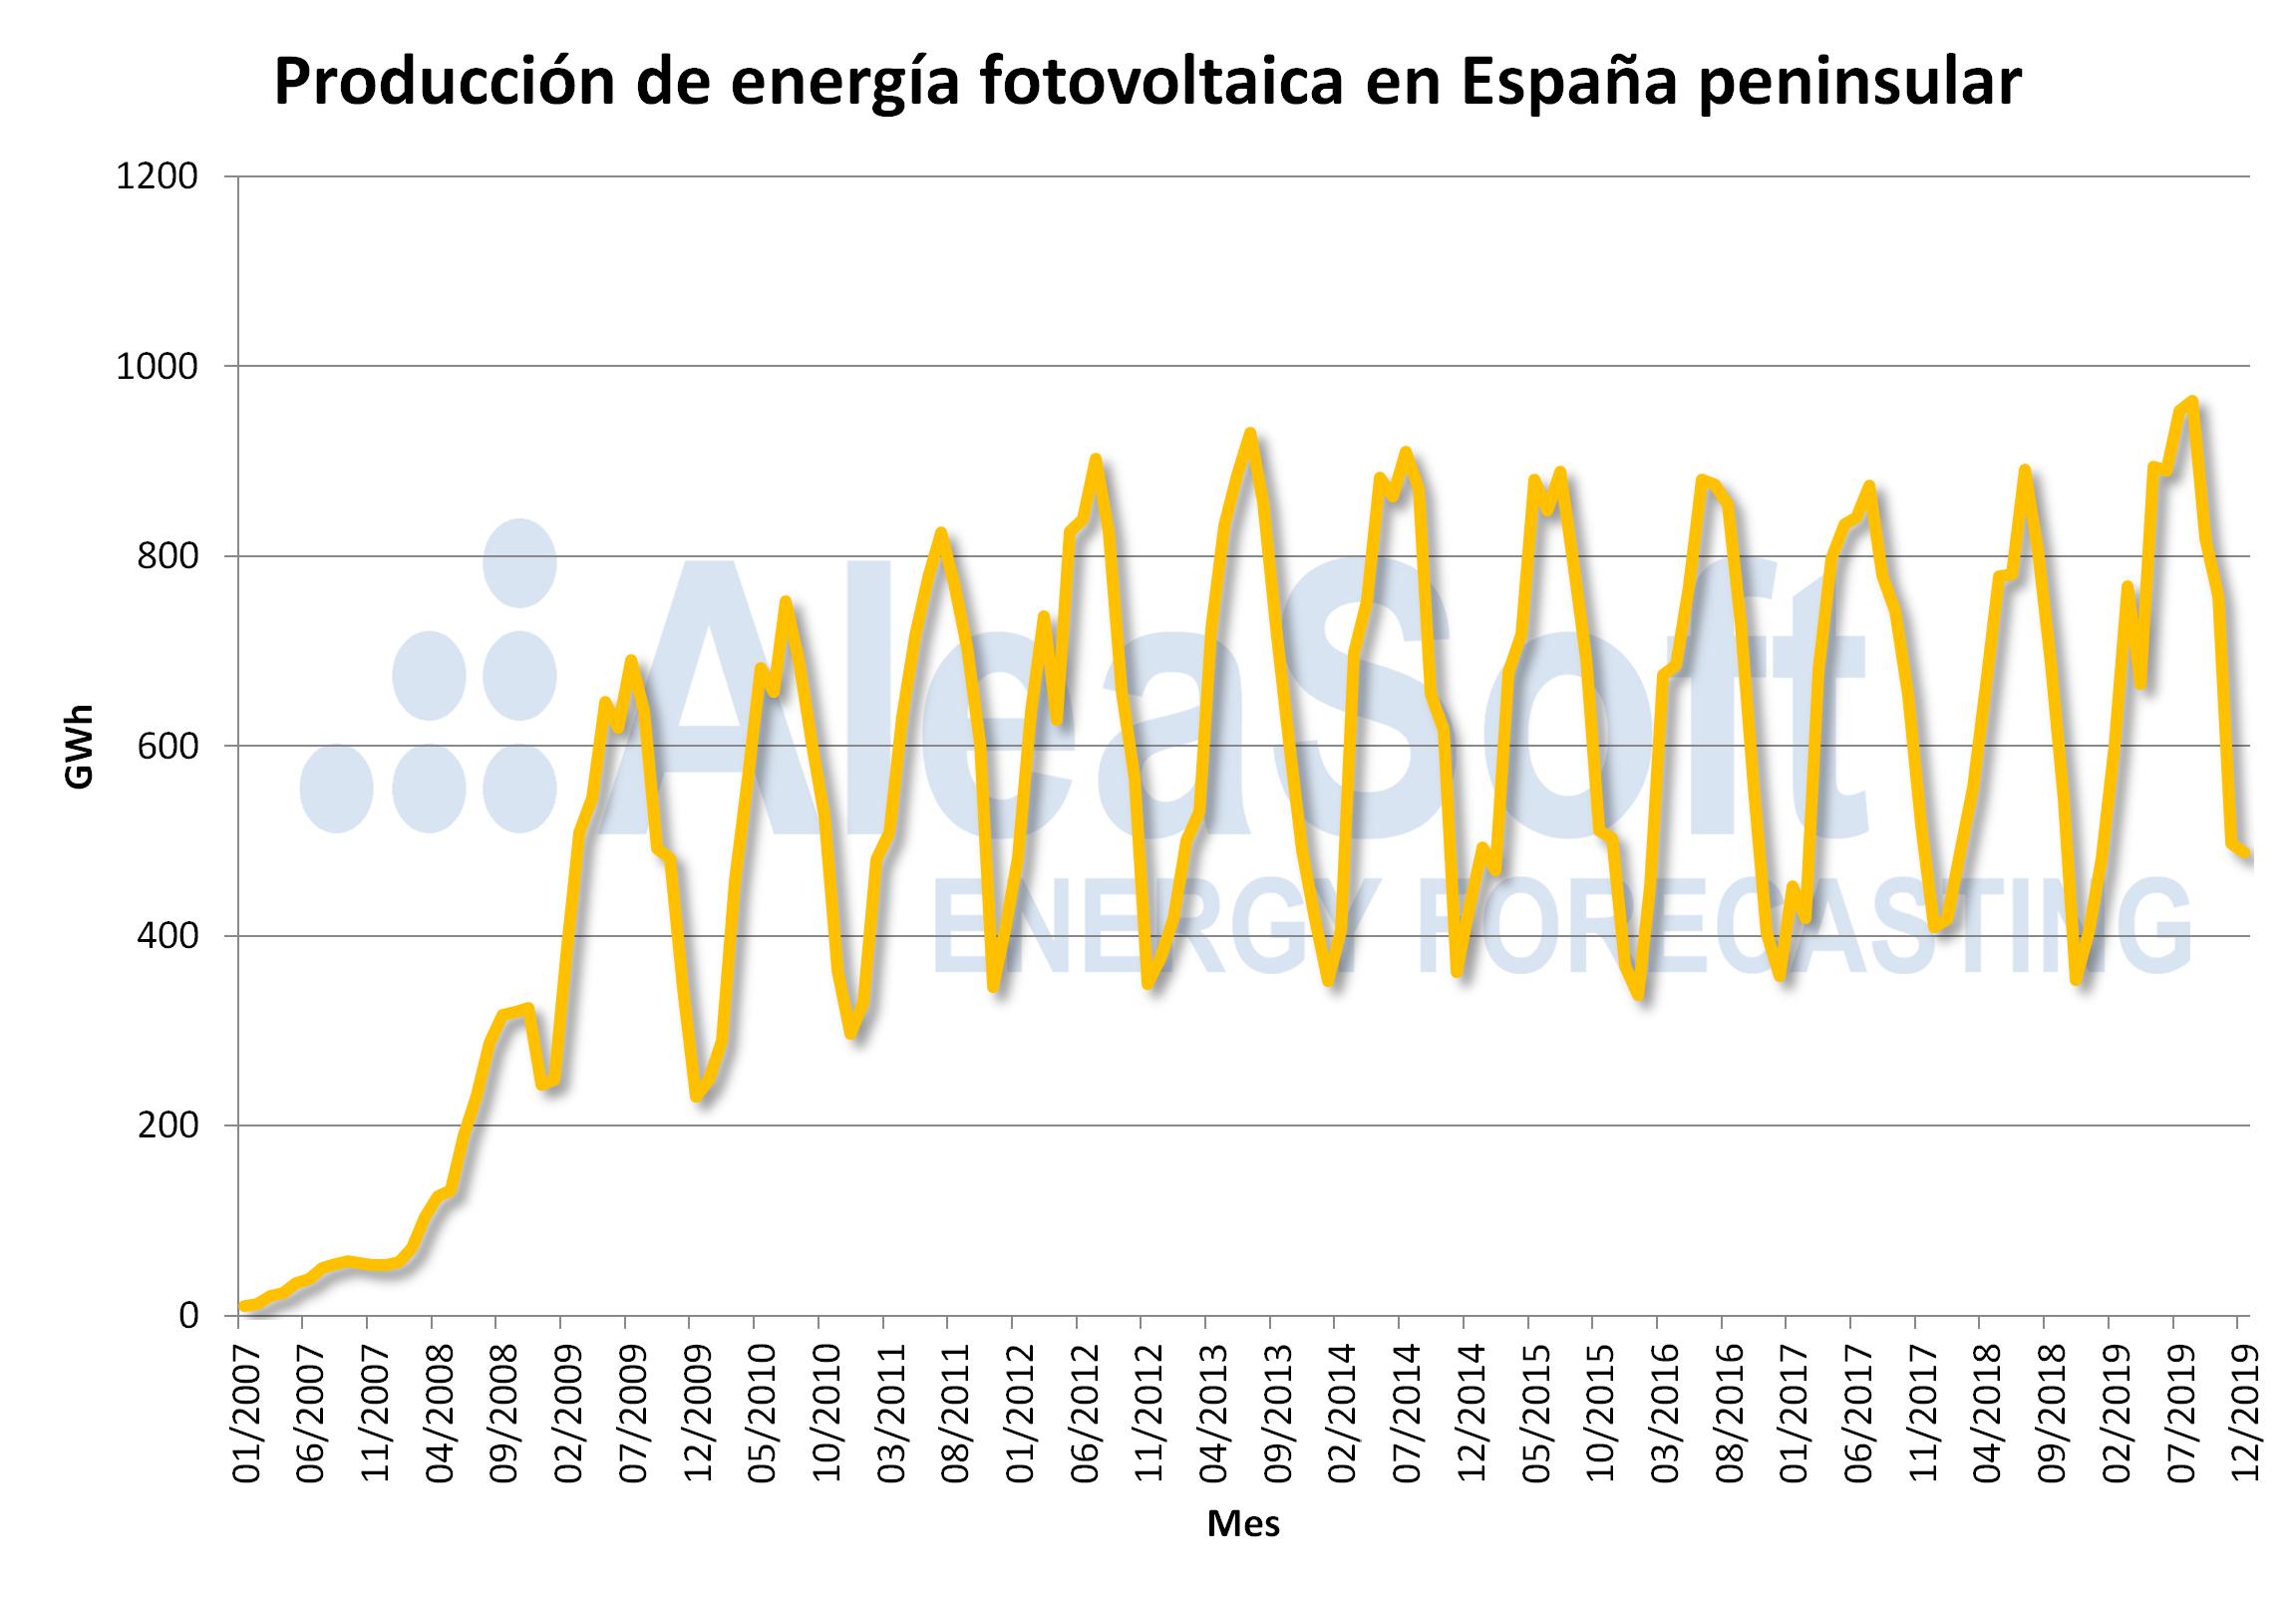 AleaSoft - Produccion energia fotovoltaica espanna peninsular